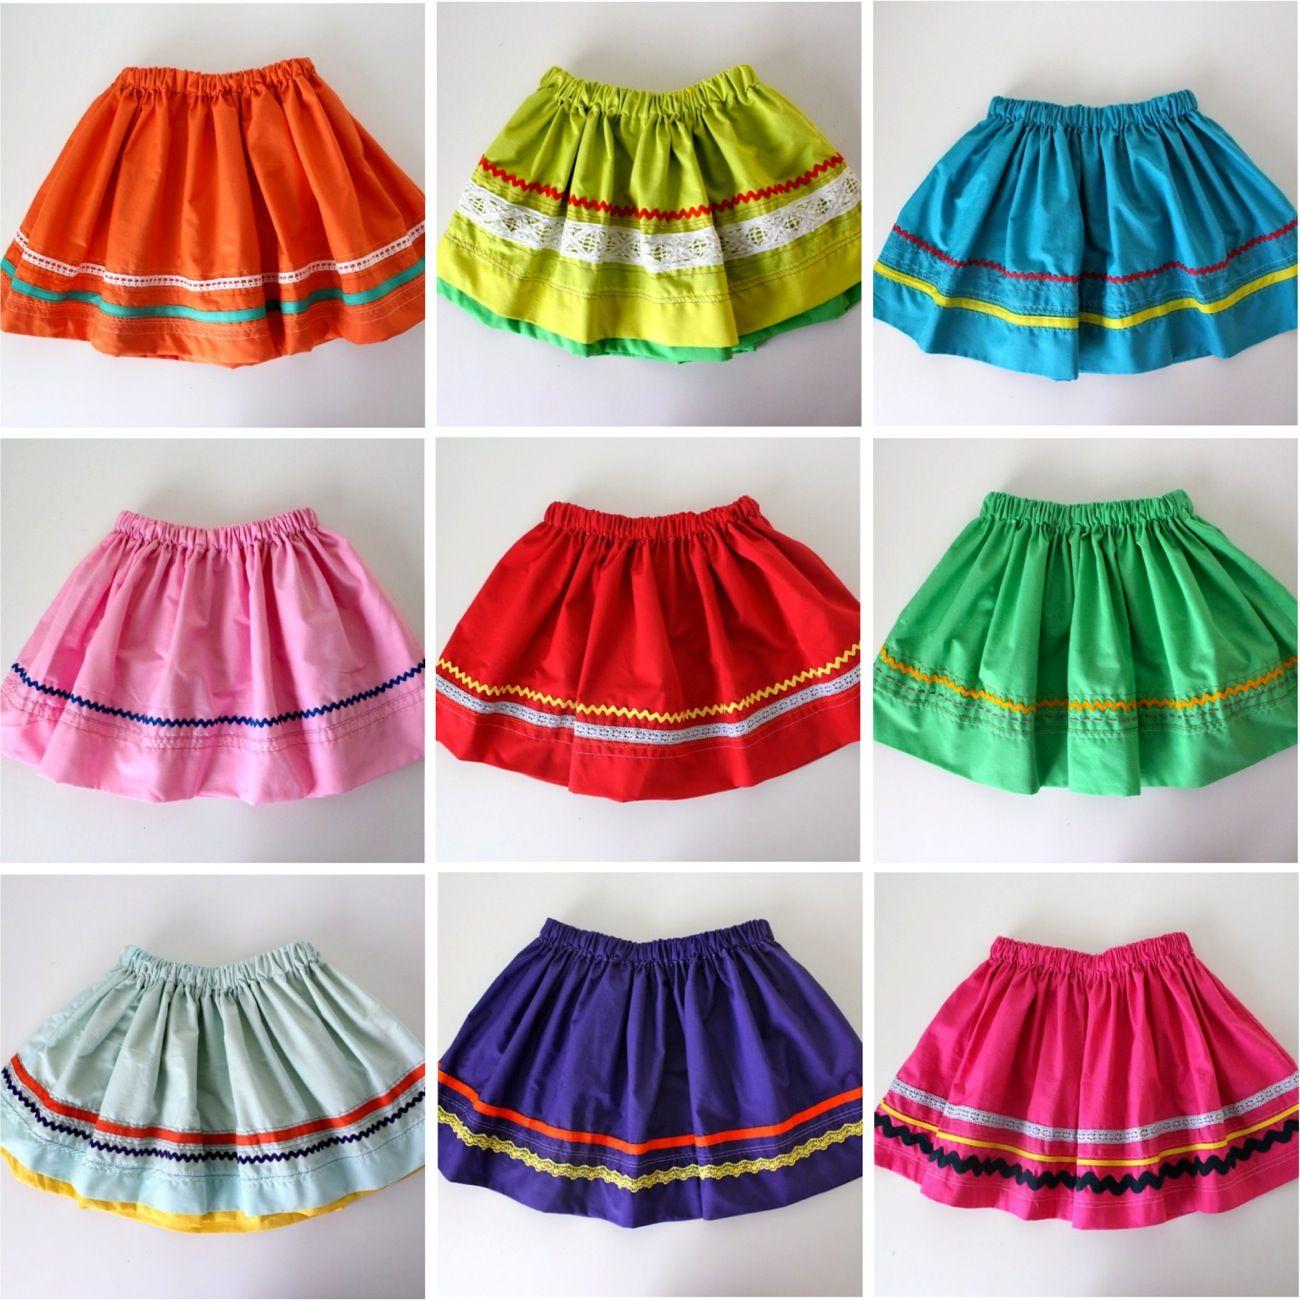 92996d1680 TUTORIAL  ¡Fiesta Skirts! for Cinco De Mayo